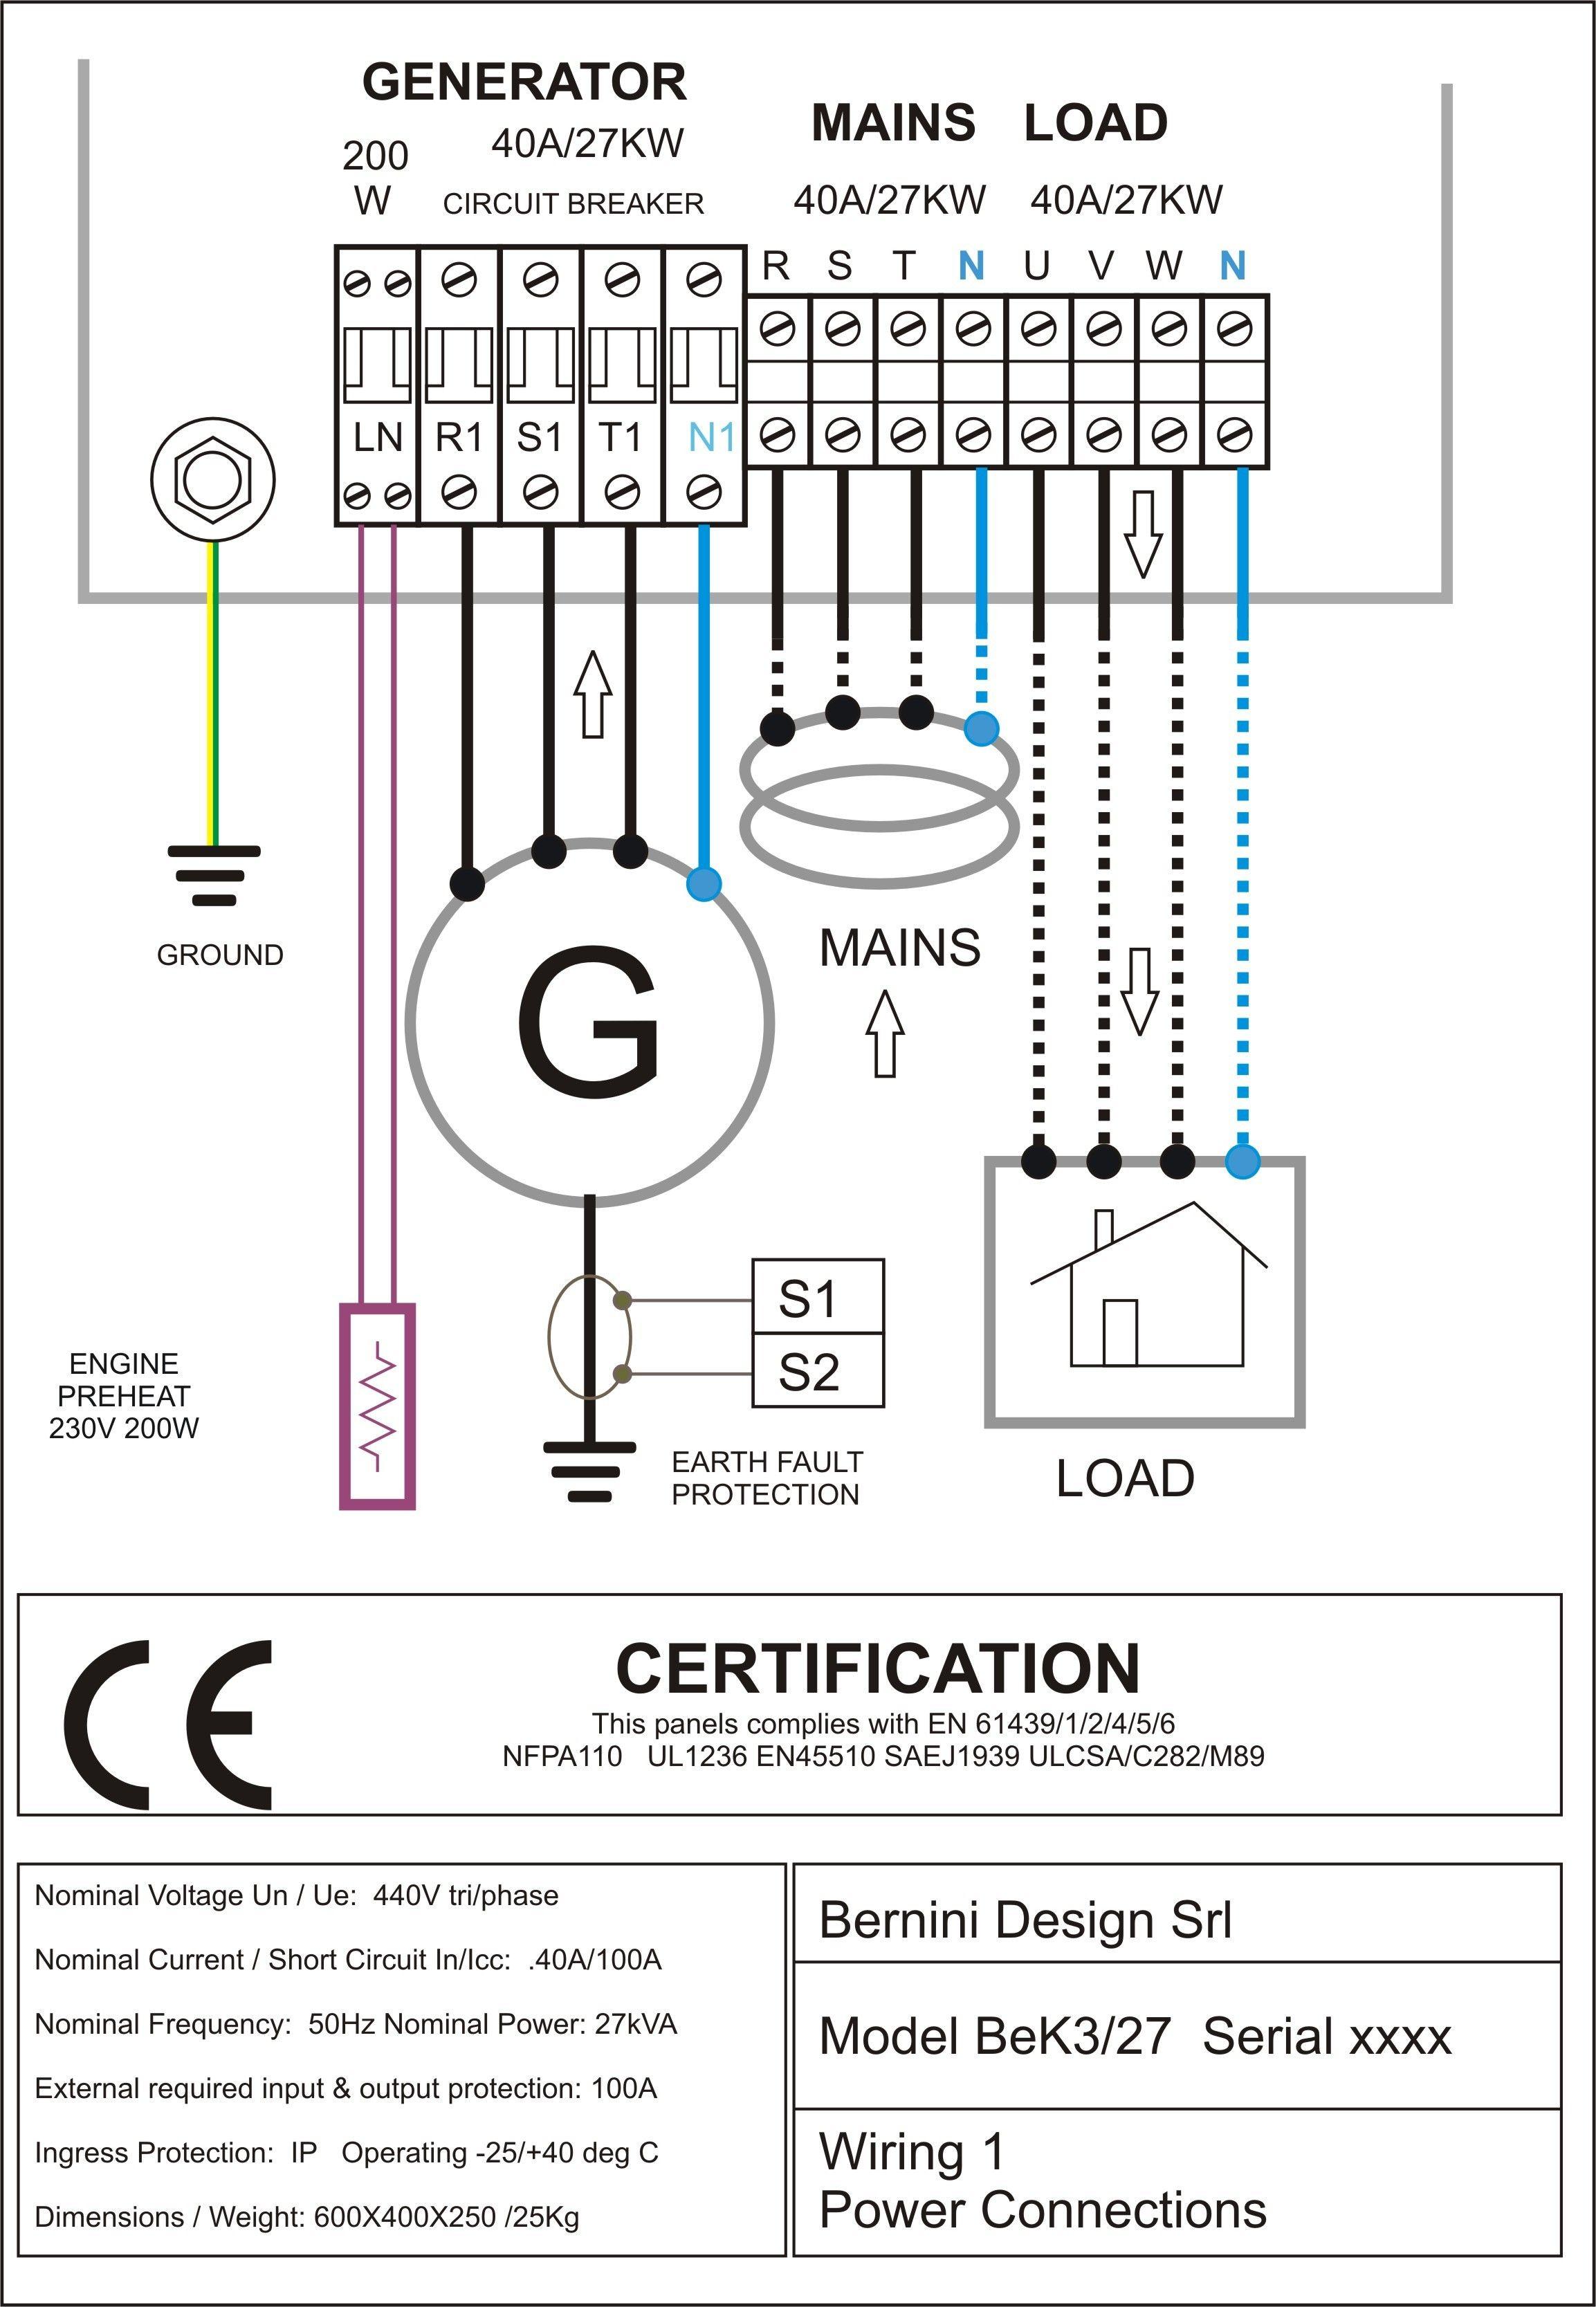 new wiring diagram load meaning diagram diagramsample diagramtemplate [ 2307 x 3335 Pixel ]